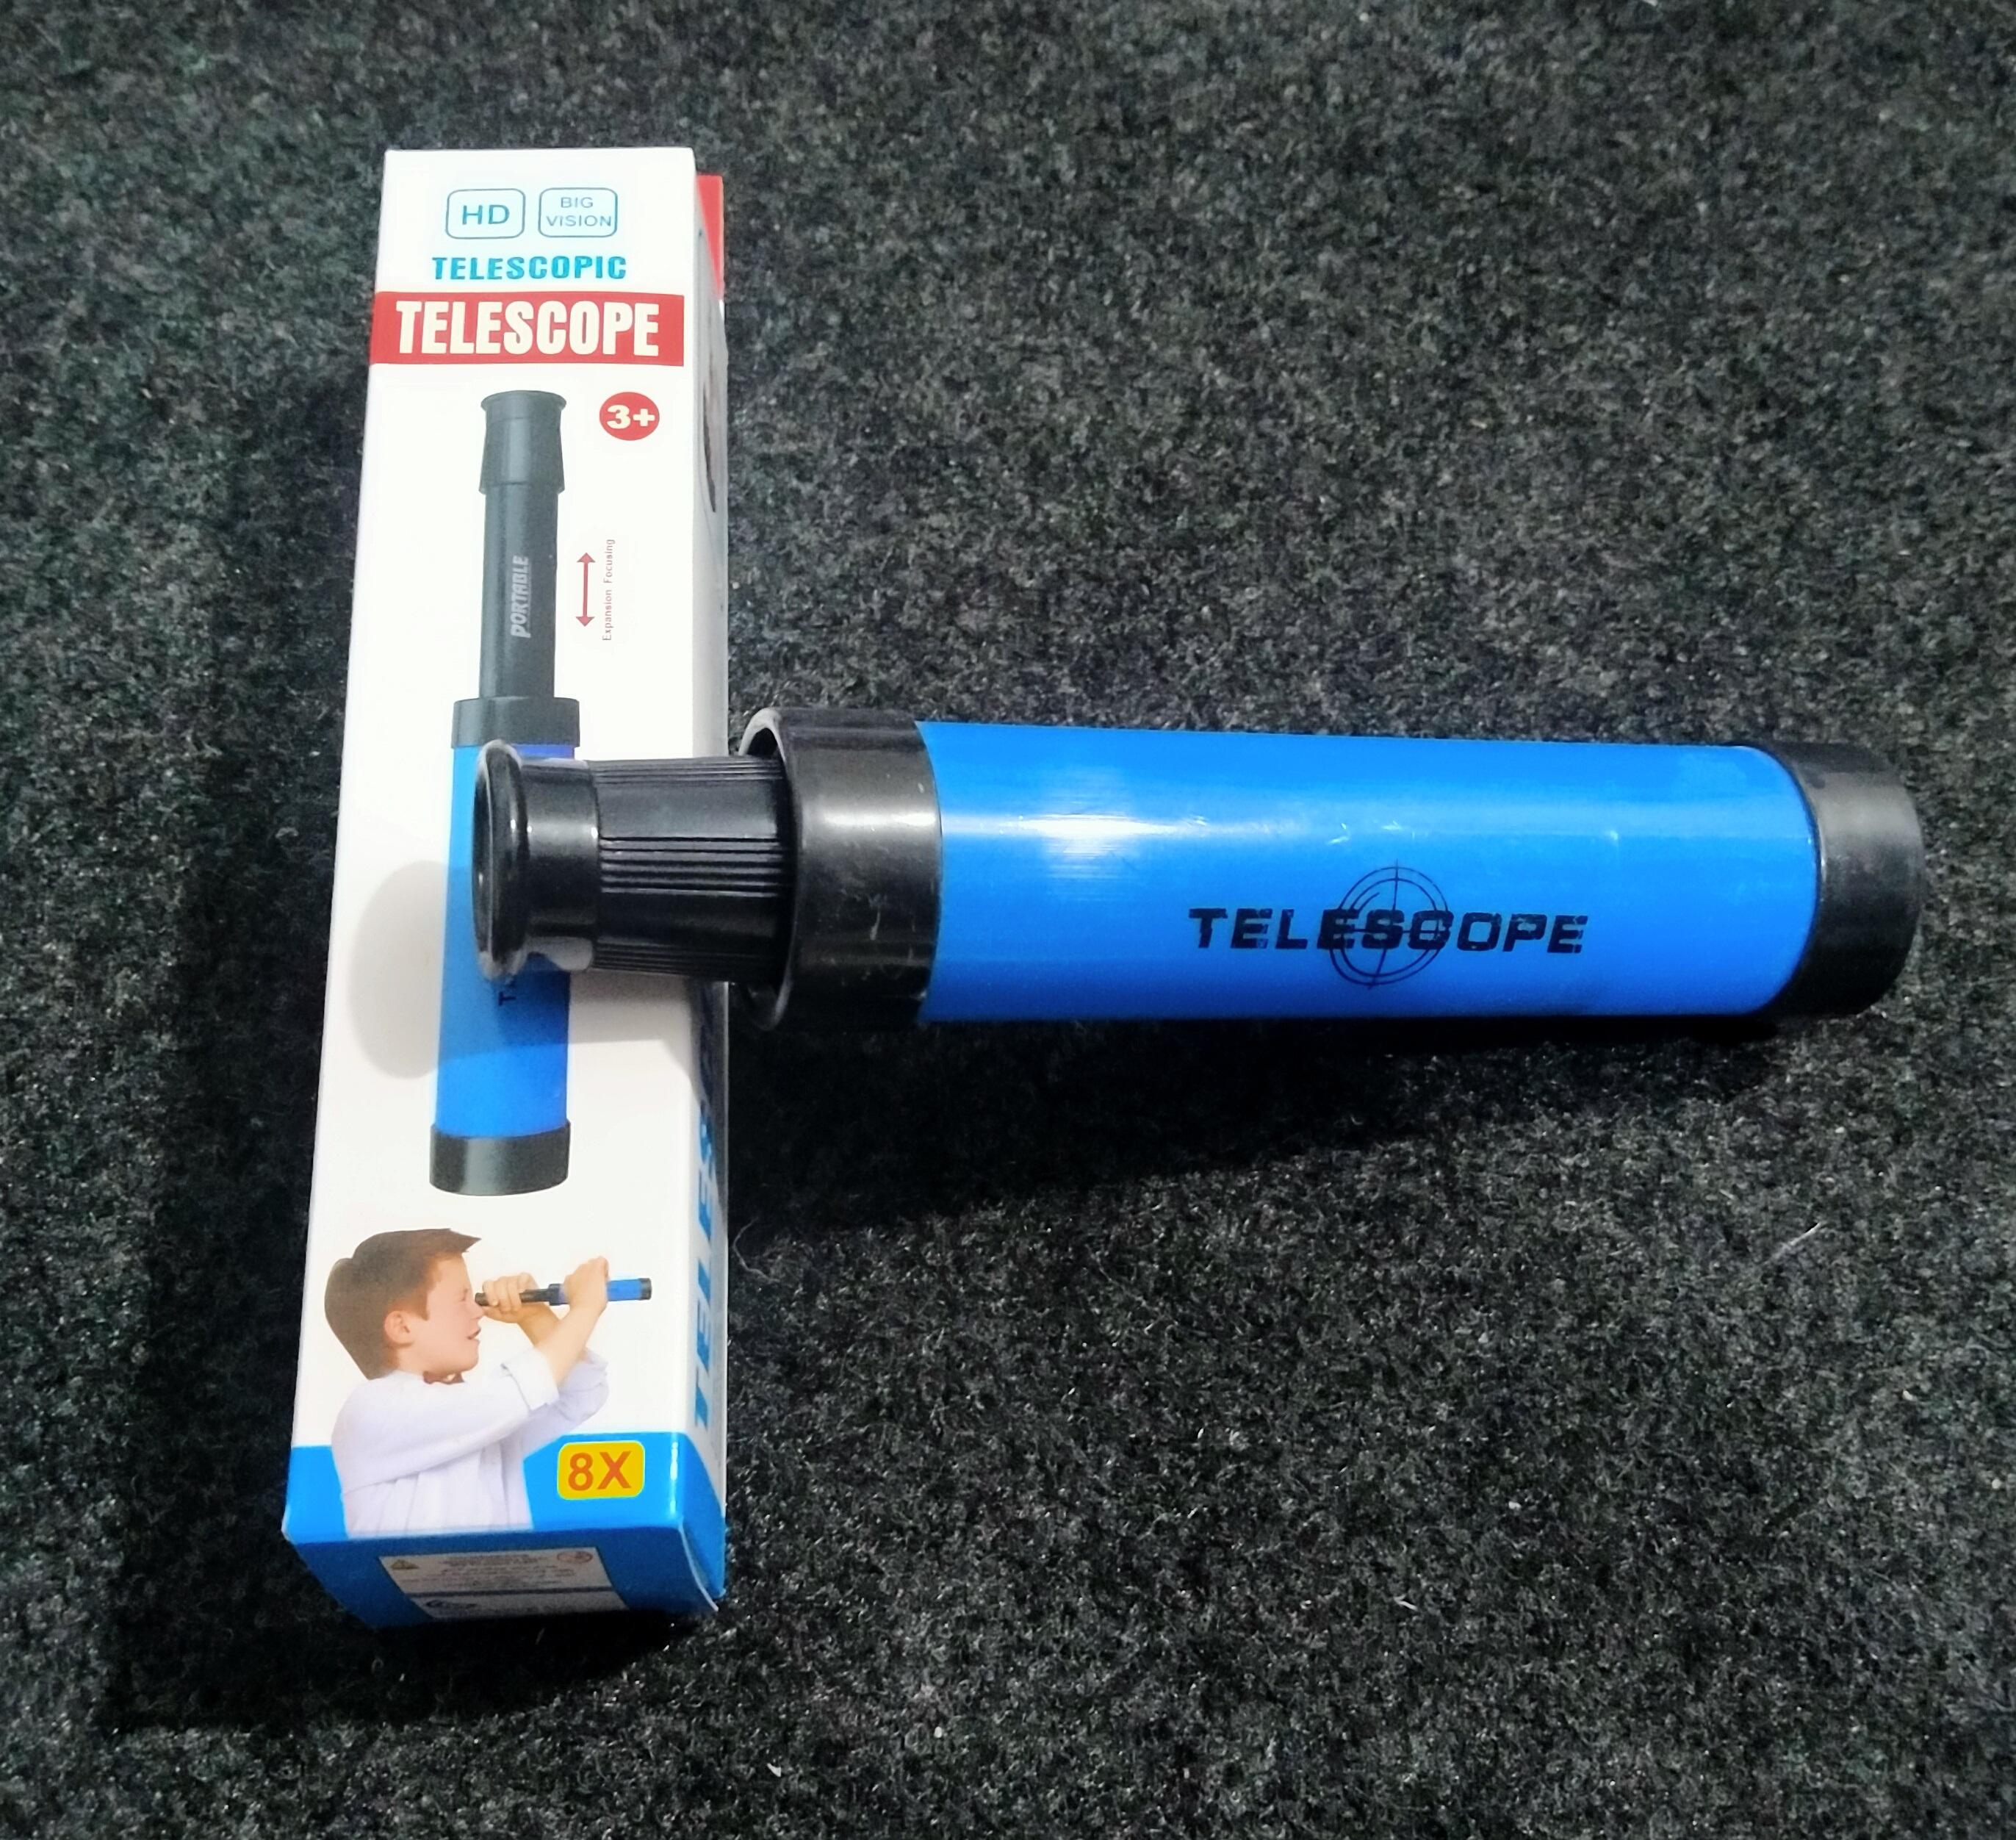 Telescope Retractable Pocket Monocular Educational Science Toys for Kids Boys Girls Fun Outdoor Activity